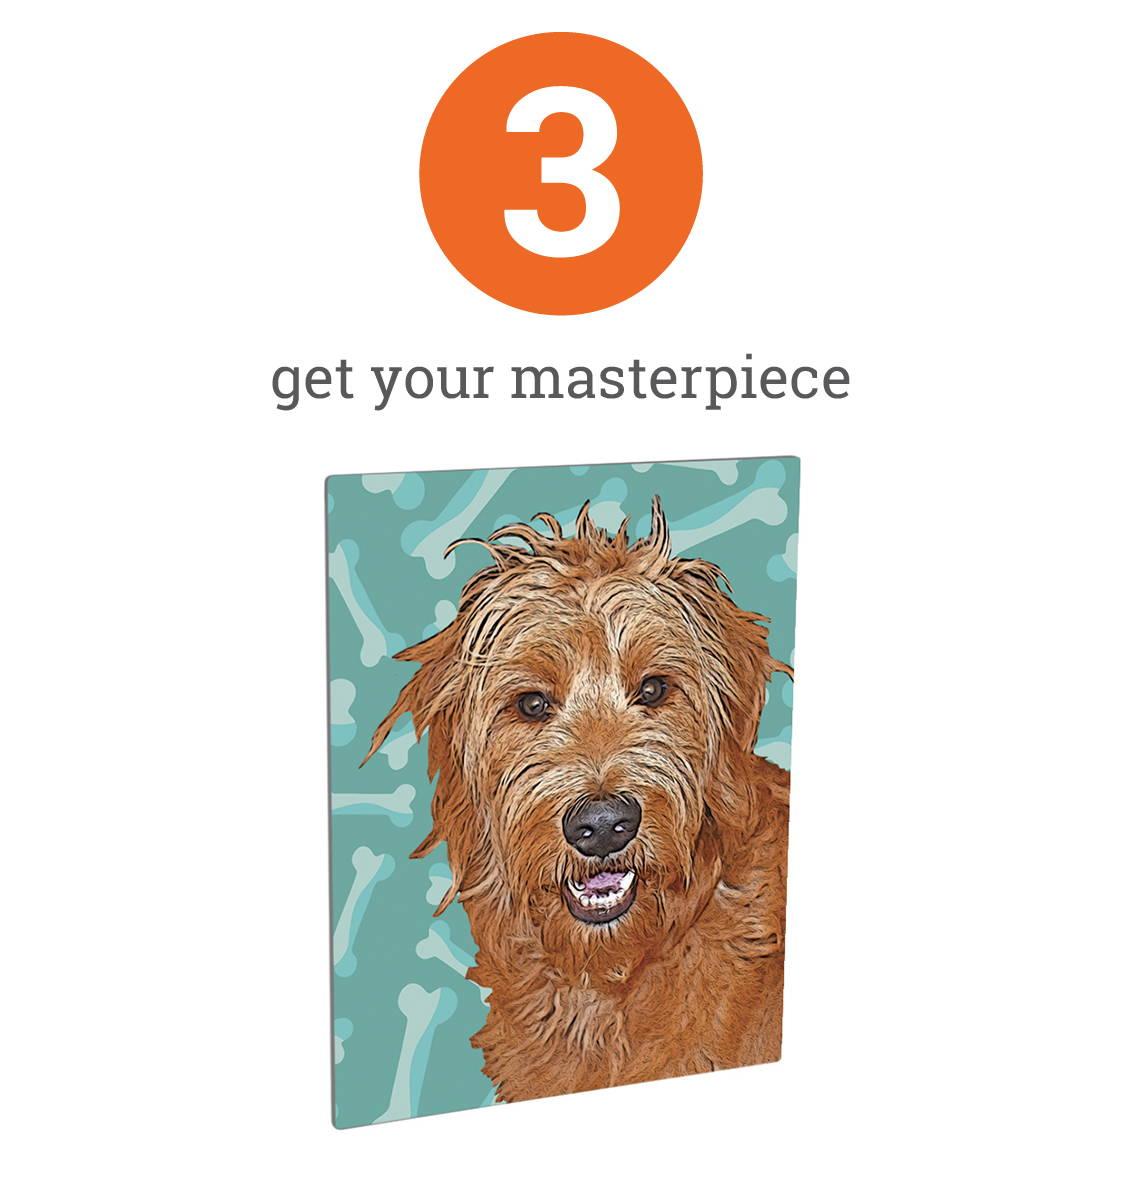 dog portrait - completed